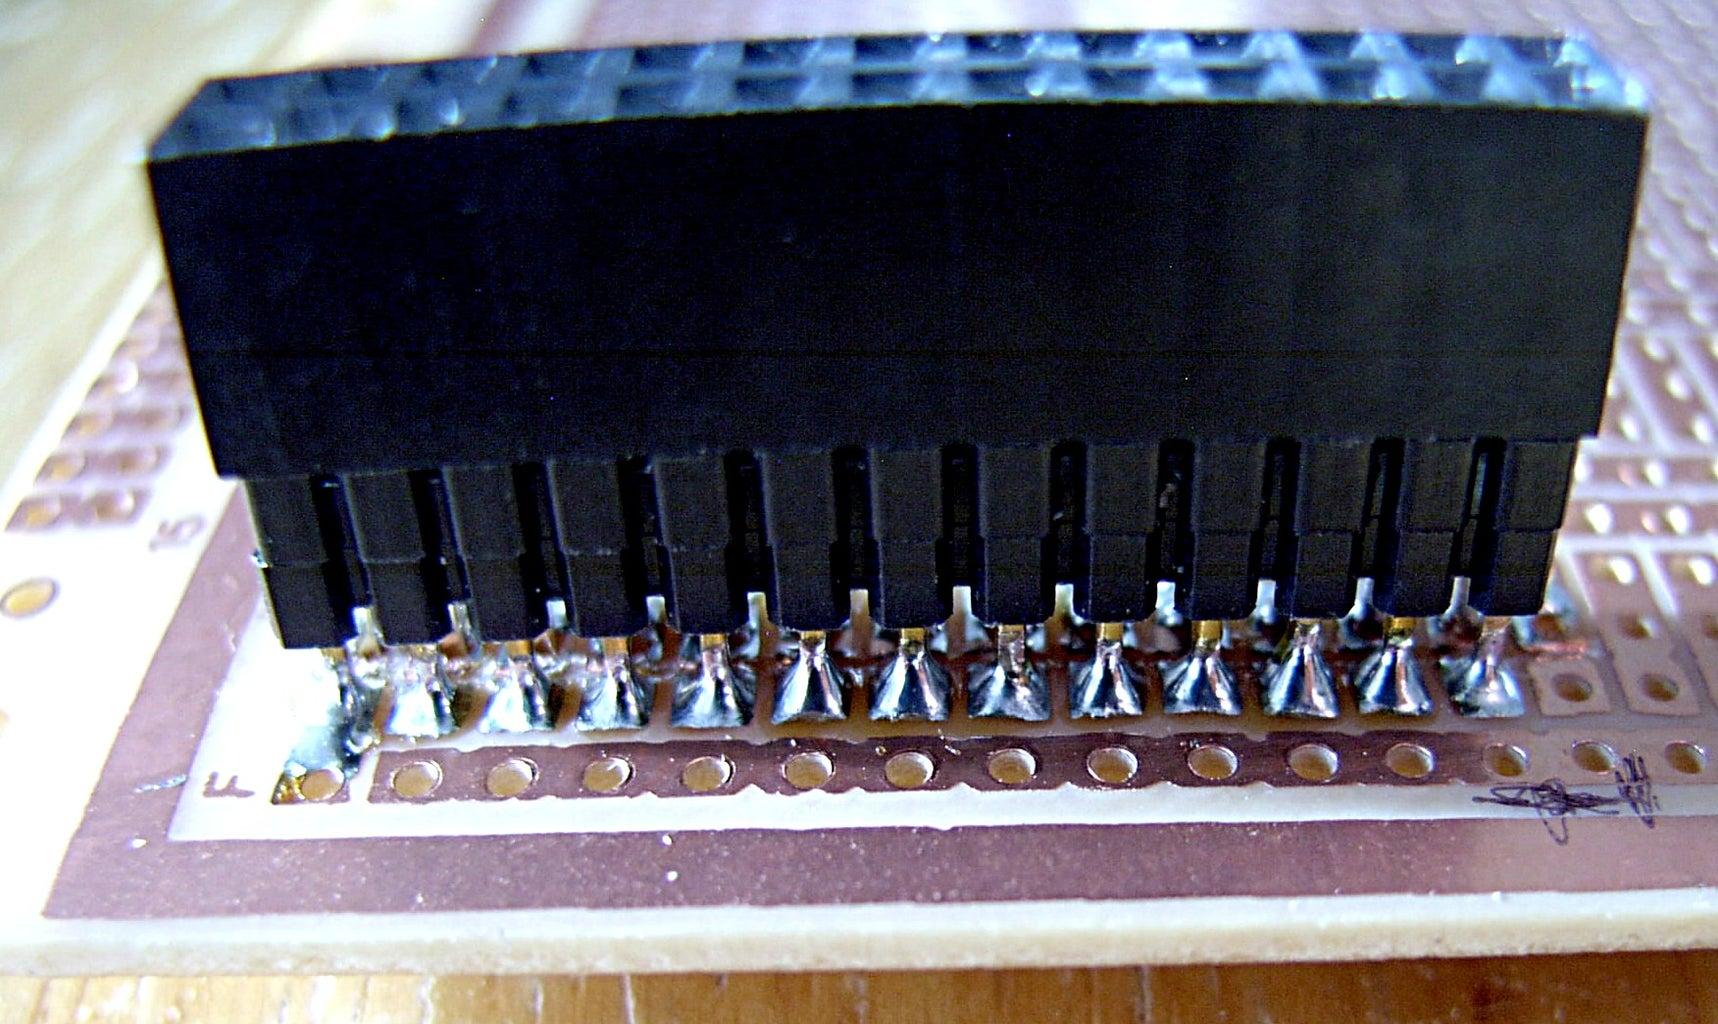 Building the Board [1]: Installing the GPIO Header